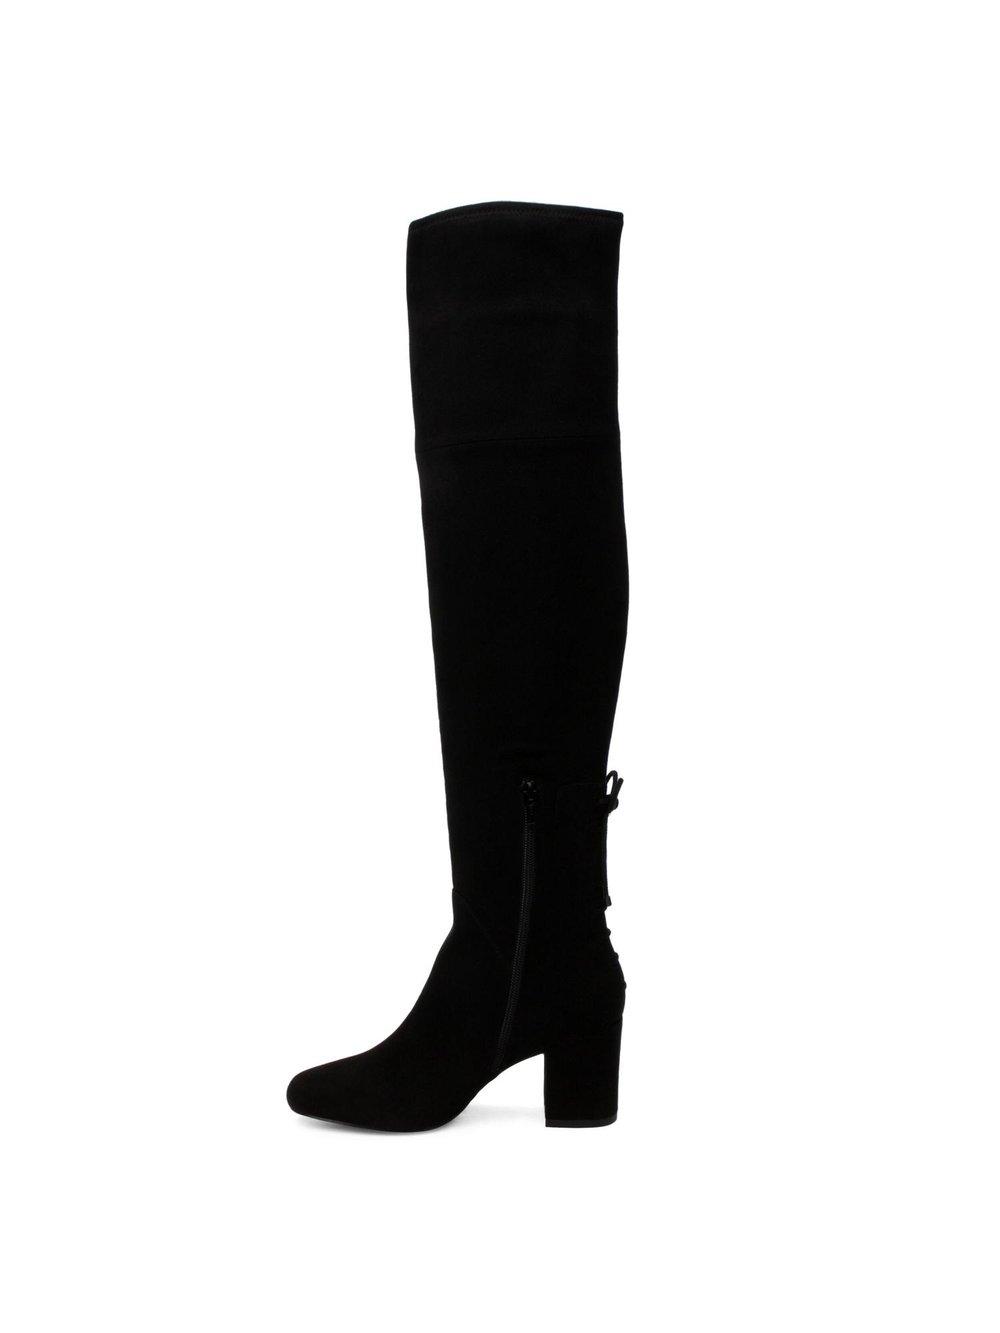 Aldo Adessi Knee High Boots